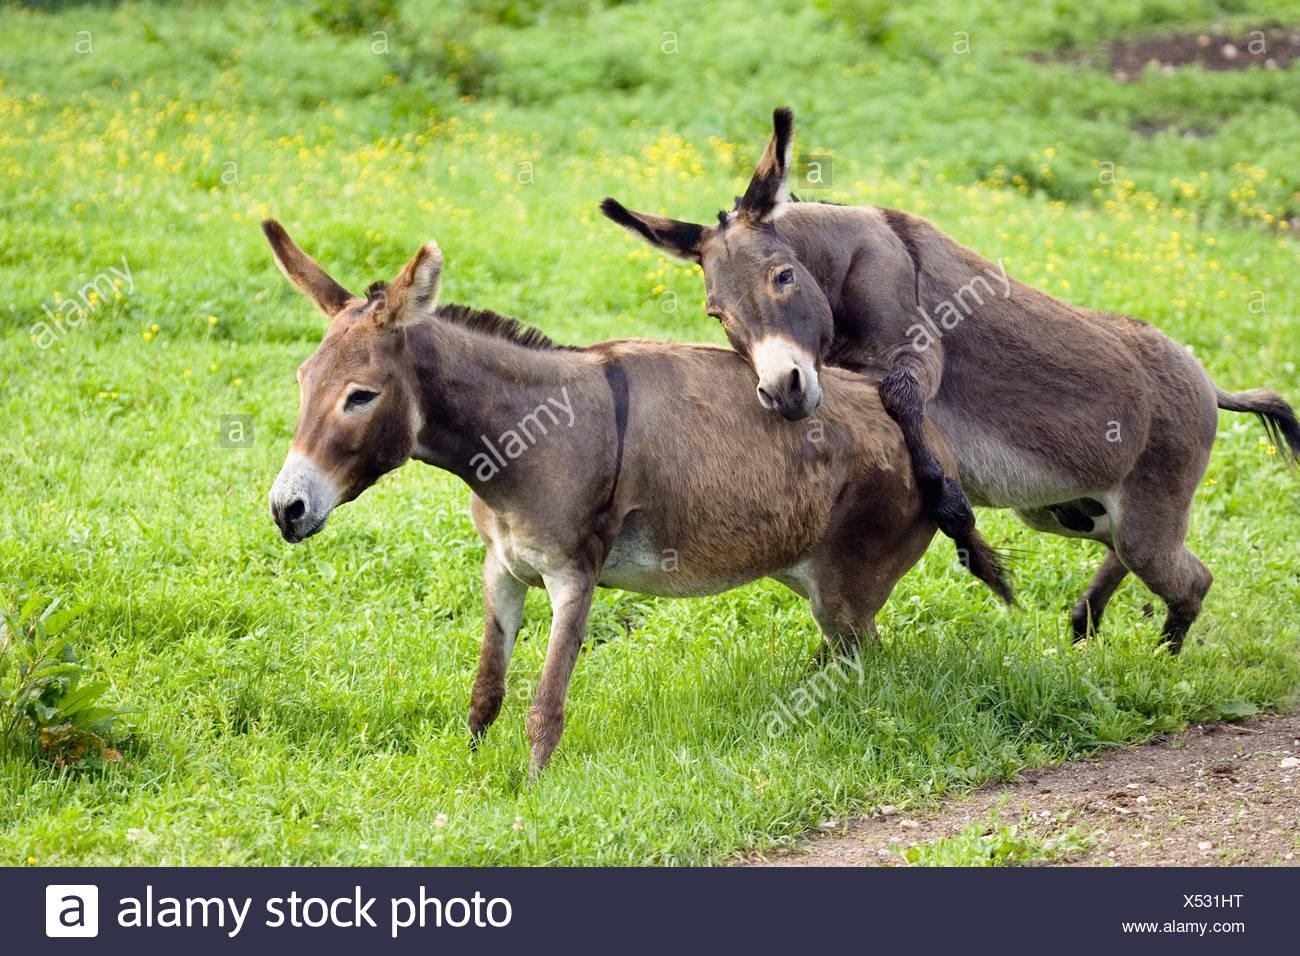 Donkeys, pair mating, Equus asinus, Germany Stock Photo